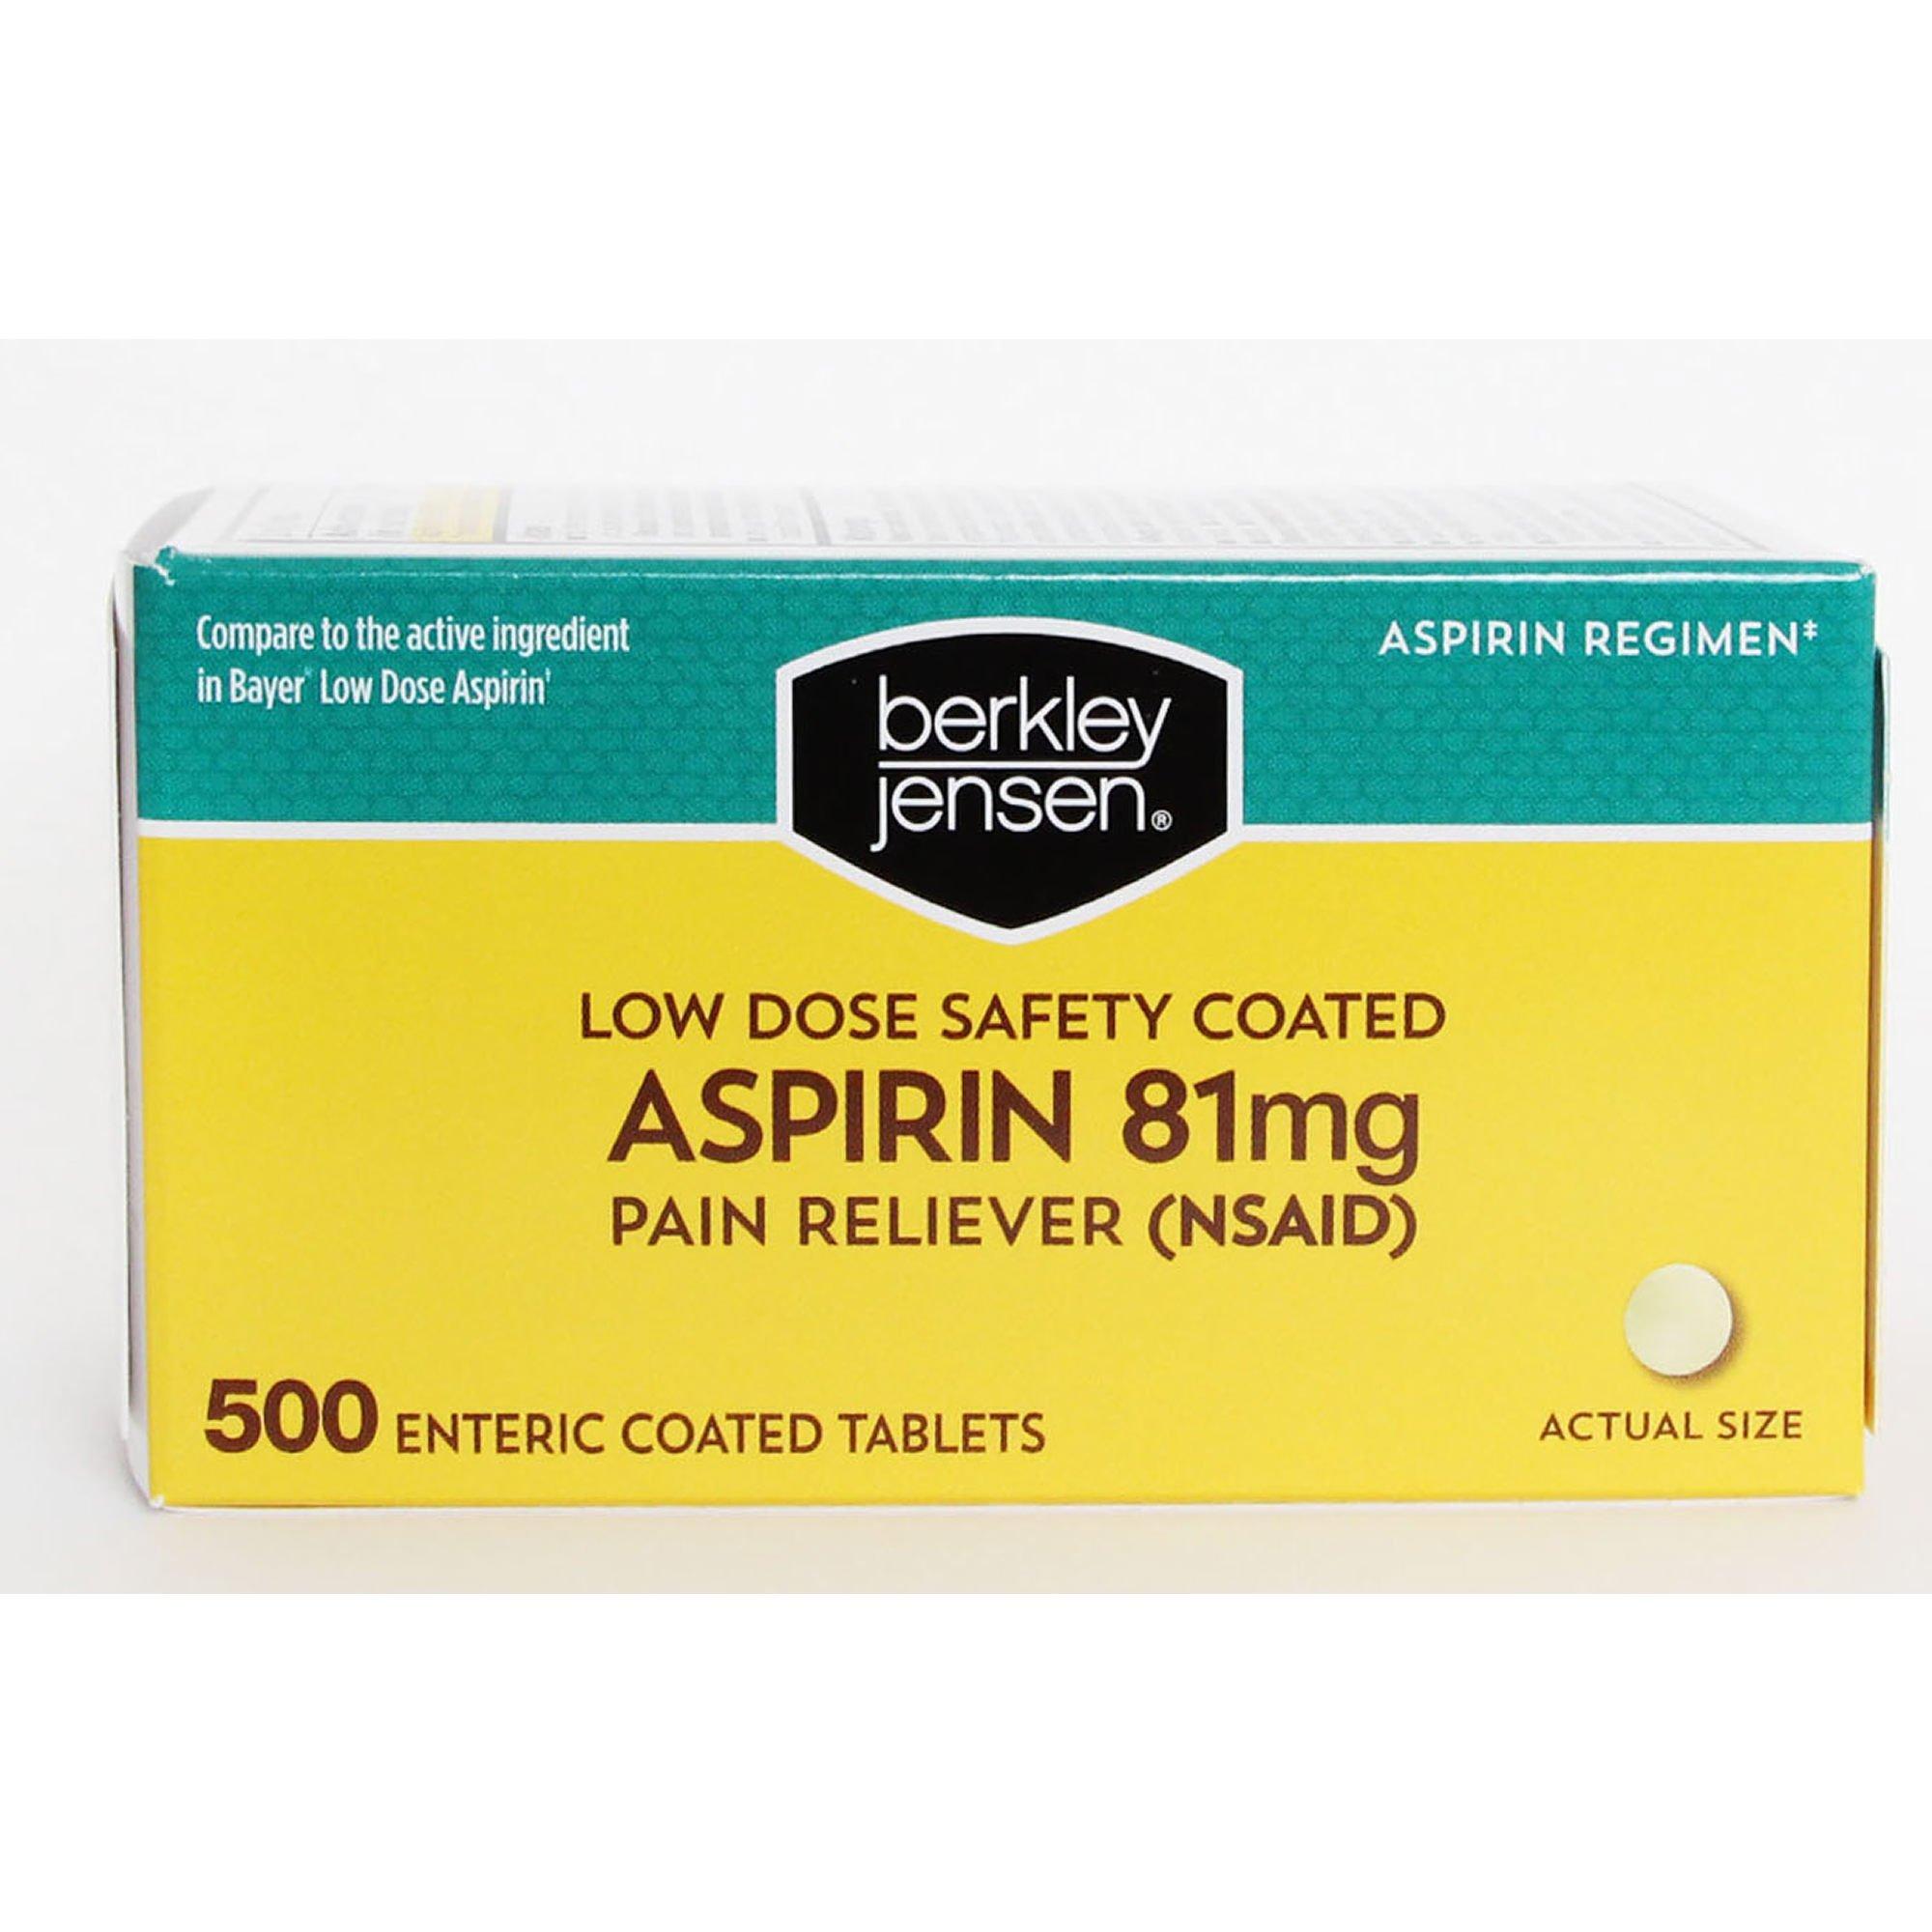 Berkley Jensen Low Dose Safety Coated Aspirin, 81 mg, 500 ct.